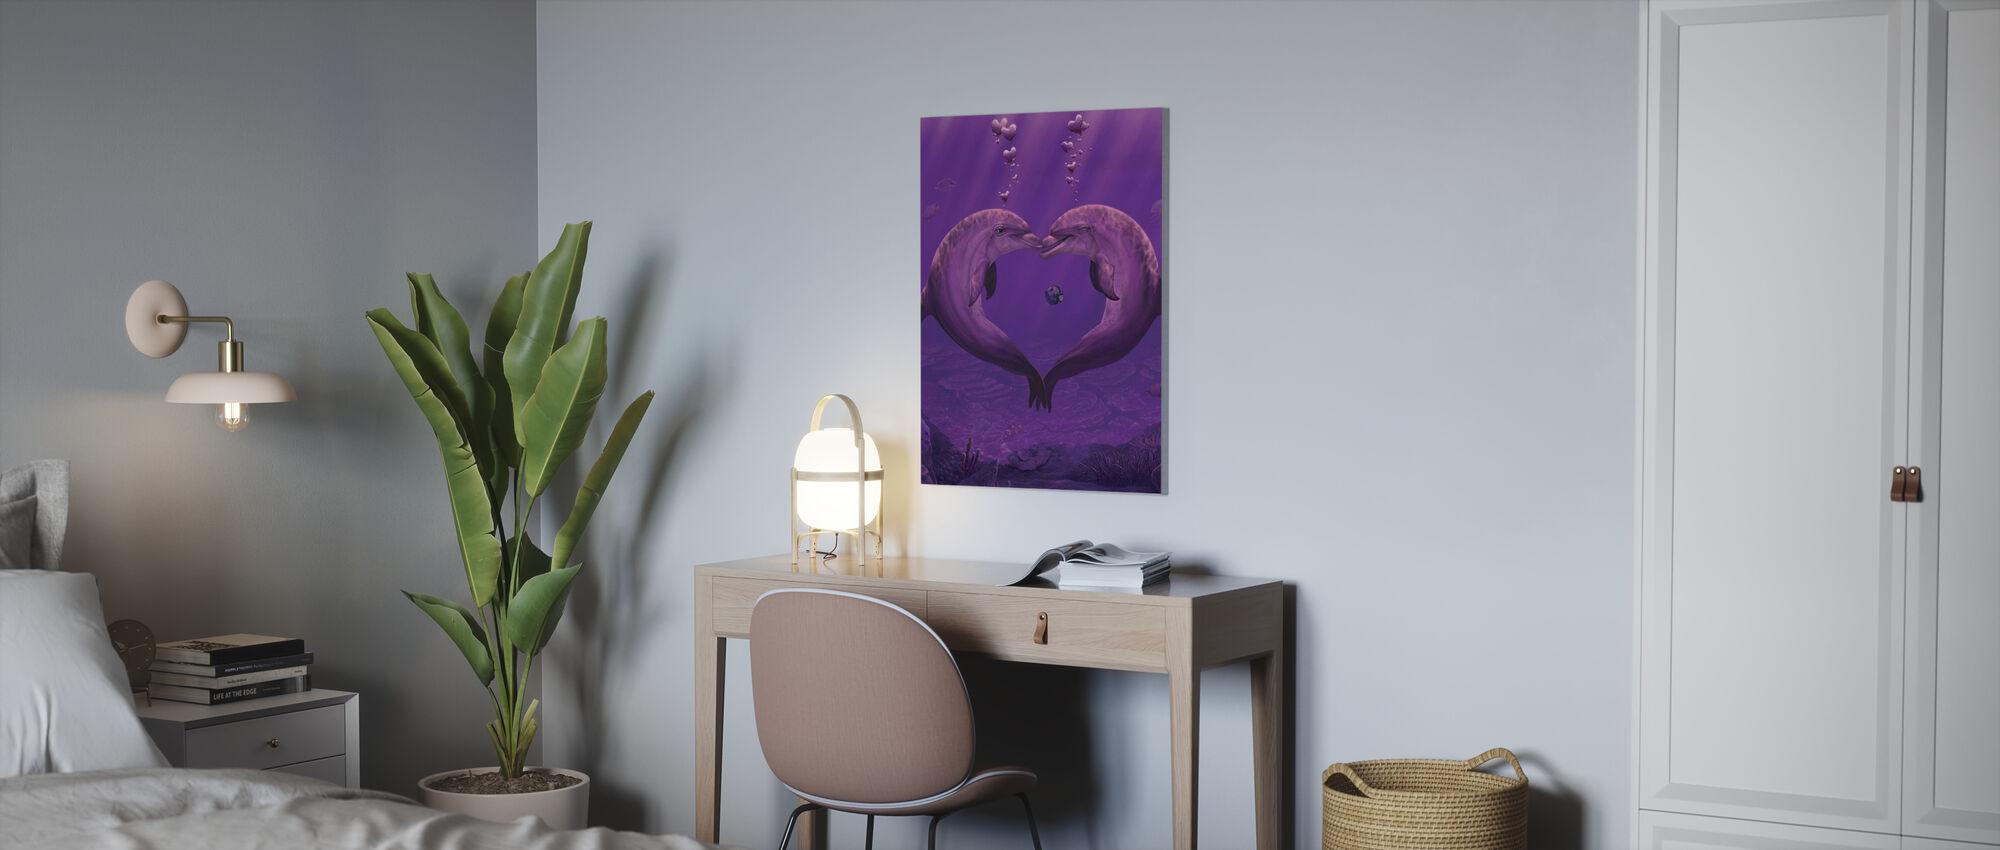 Sea of Hearts - Canvas print - Office